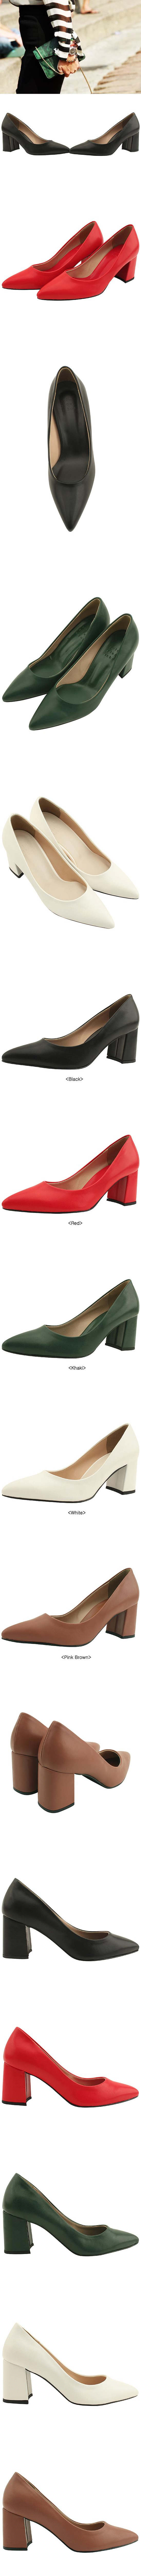 Stiletto square heel high heels red